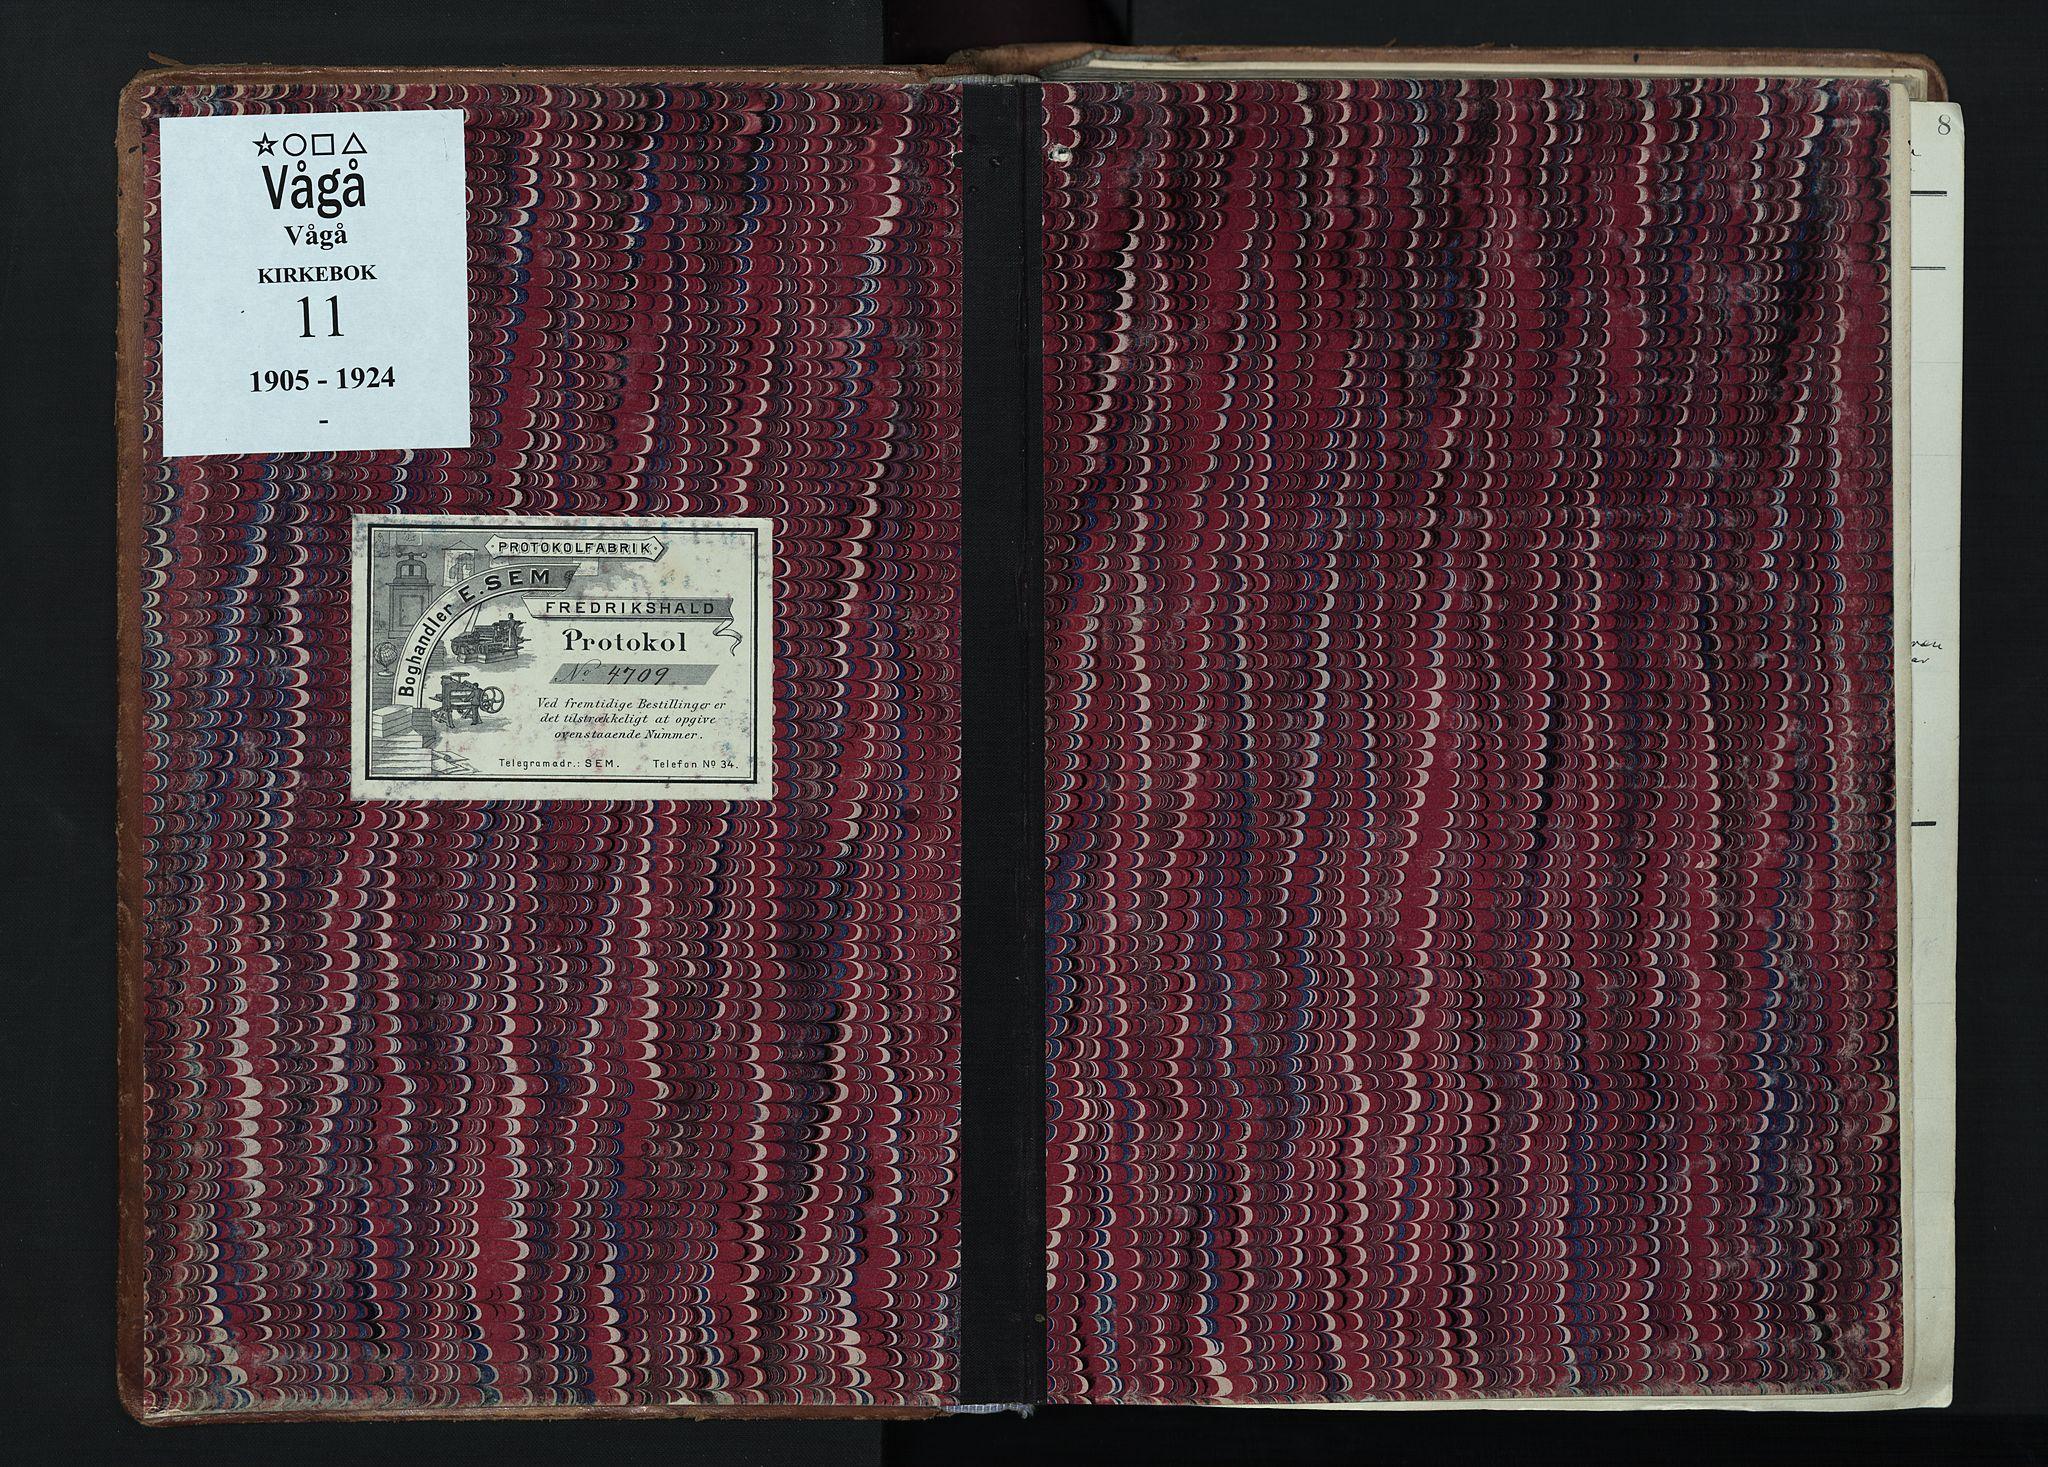 SAH, Vågå prestekontor, Ministerialbok nr. 11, 1905-1924